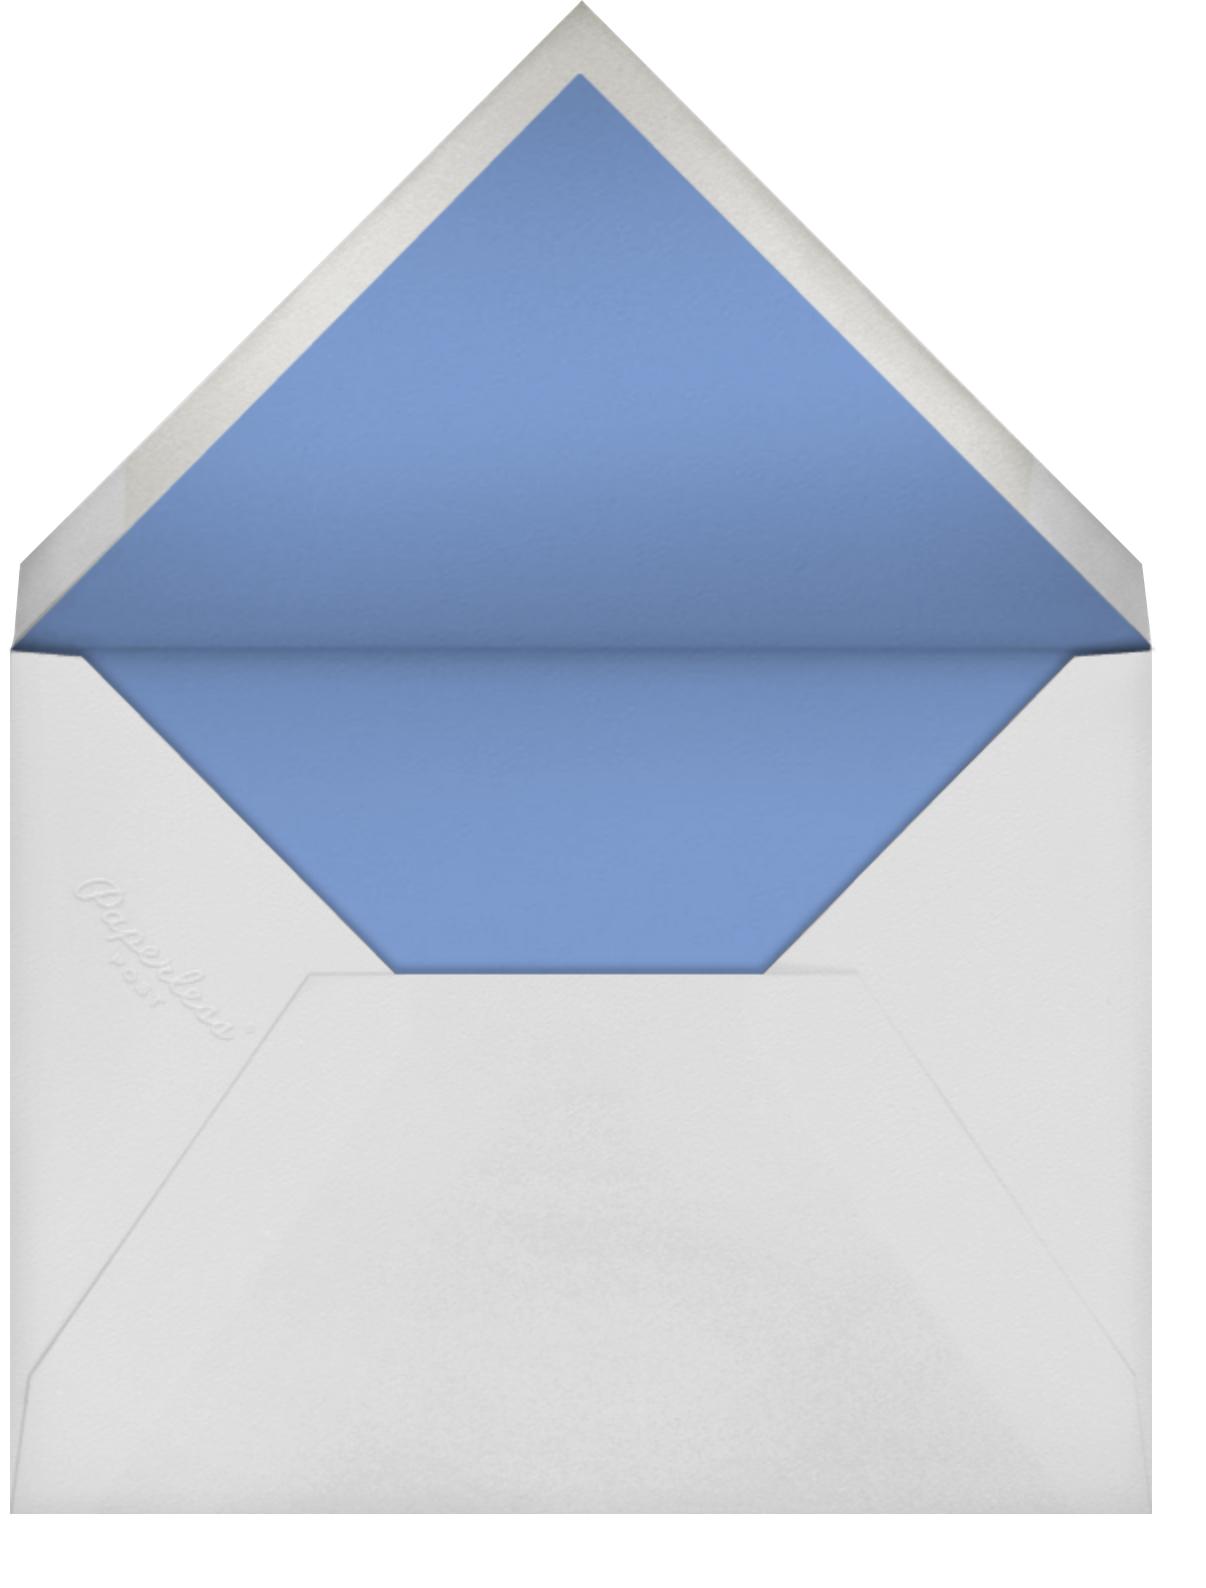 Jacquard Stripe - Oscar de la Renta - Adult birthday - envelope back